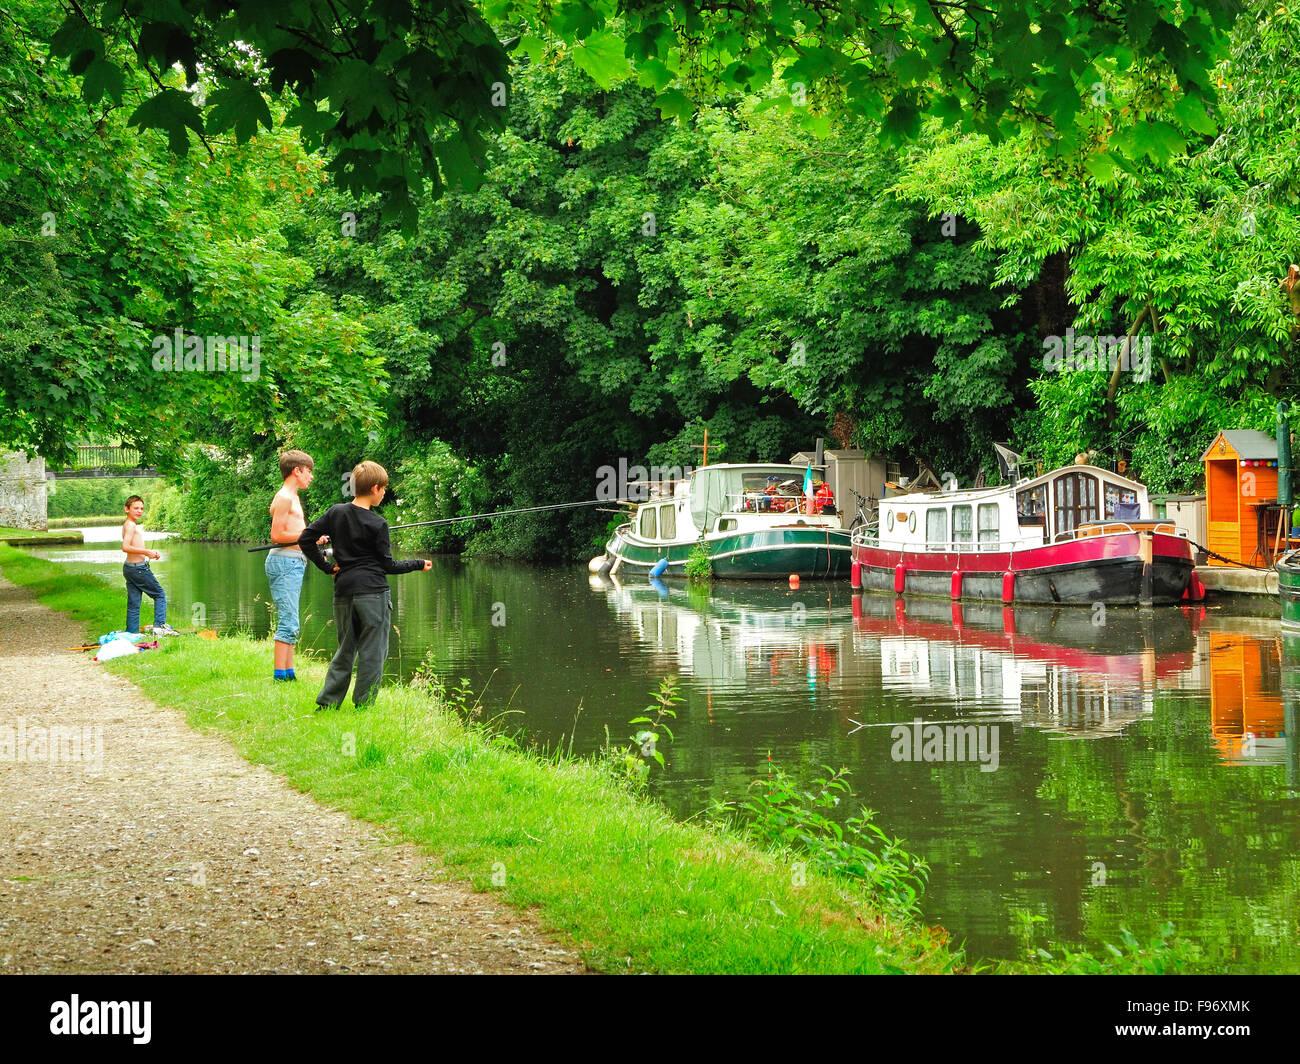 boys fishing in Grand Union Canal near Hemel Hempstead, Hertfordshire, England - Stock Image